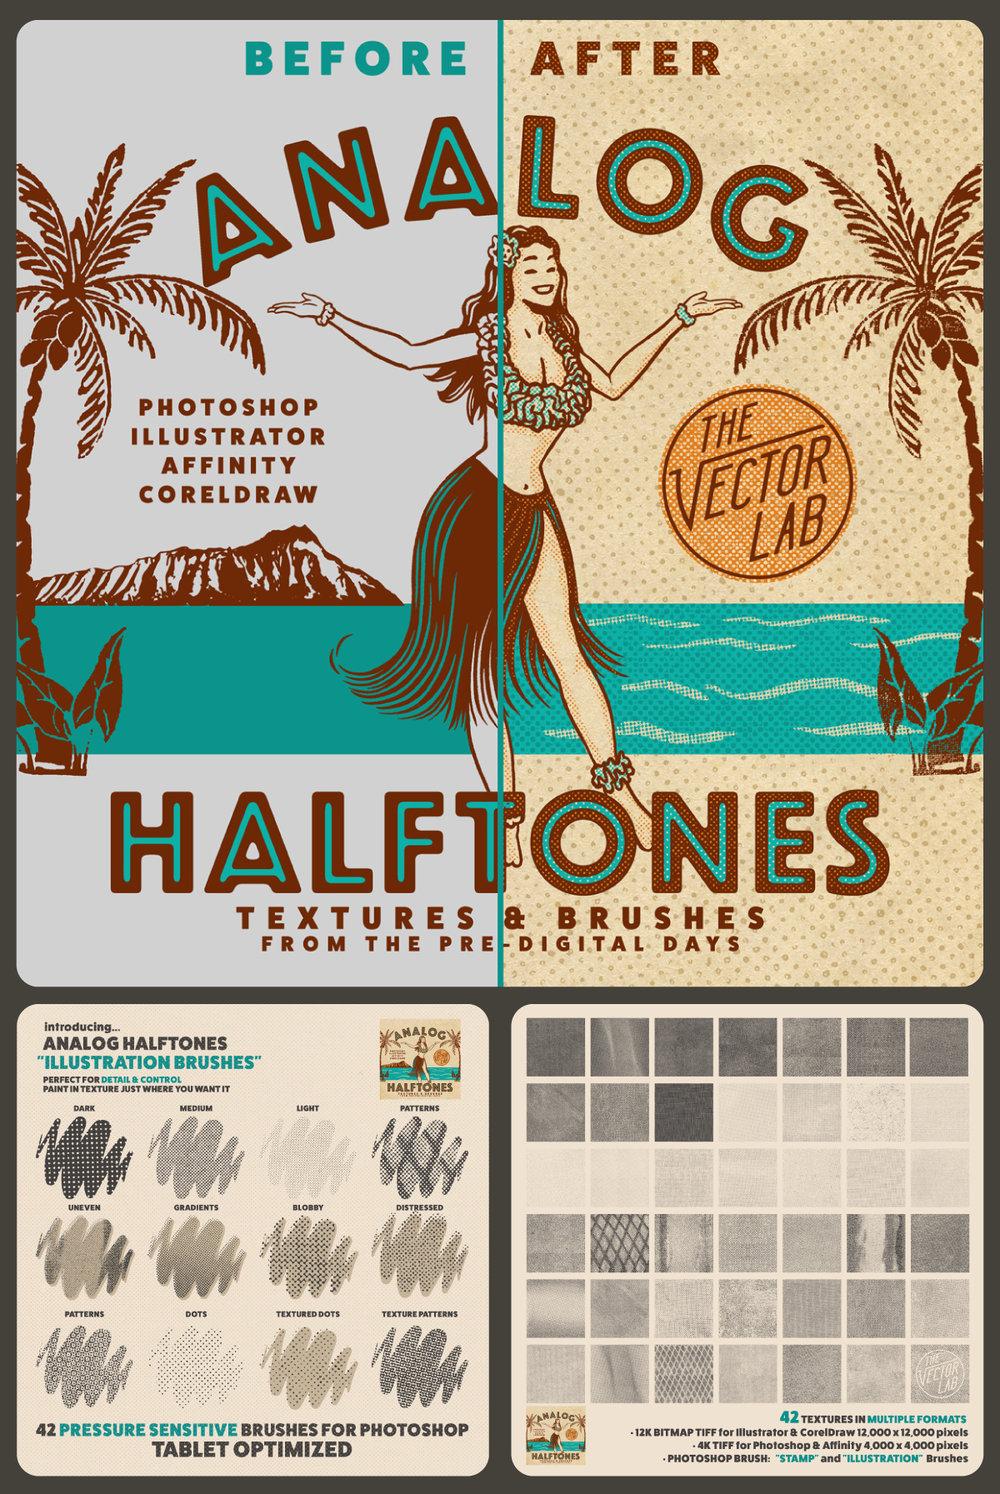 ANALOG-HALFTONES-THEVECTORLAB.jpg